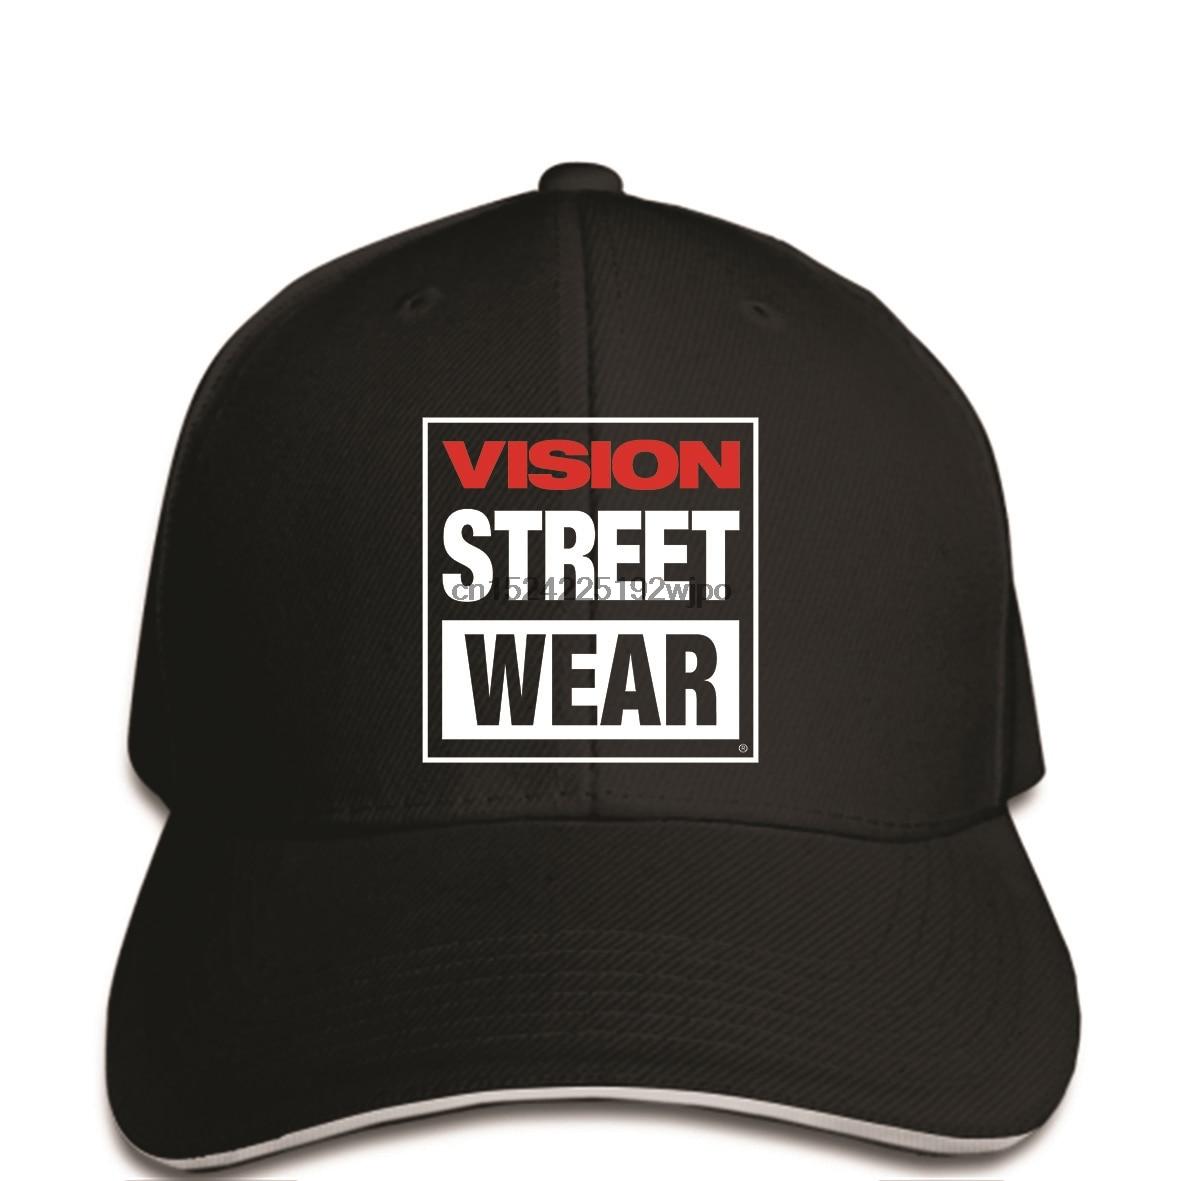 Spiderwire Logo Cap Mens Fashion Wire Data Schema Wiring Harness Ml320snap2jpg Men Baseball Vision Street Wear Classic Big Funny Rh Aliexpress Com